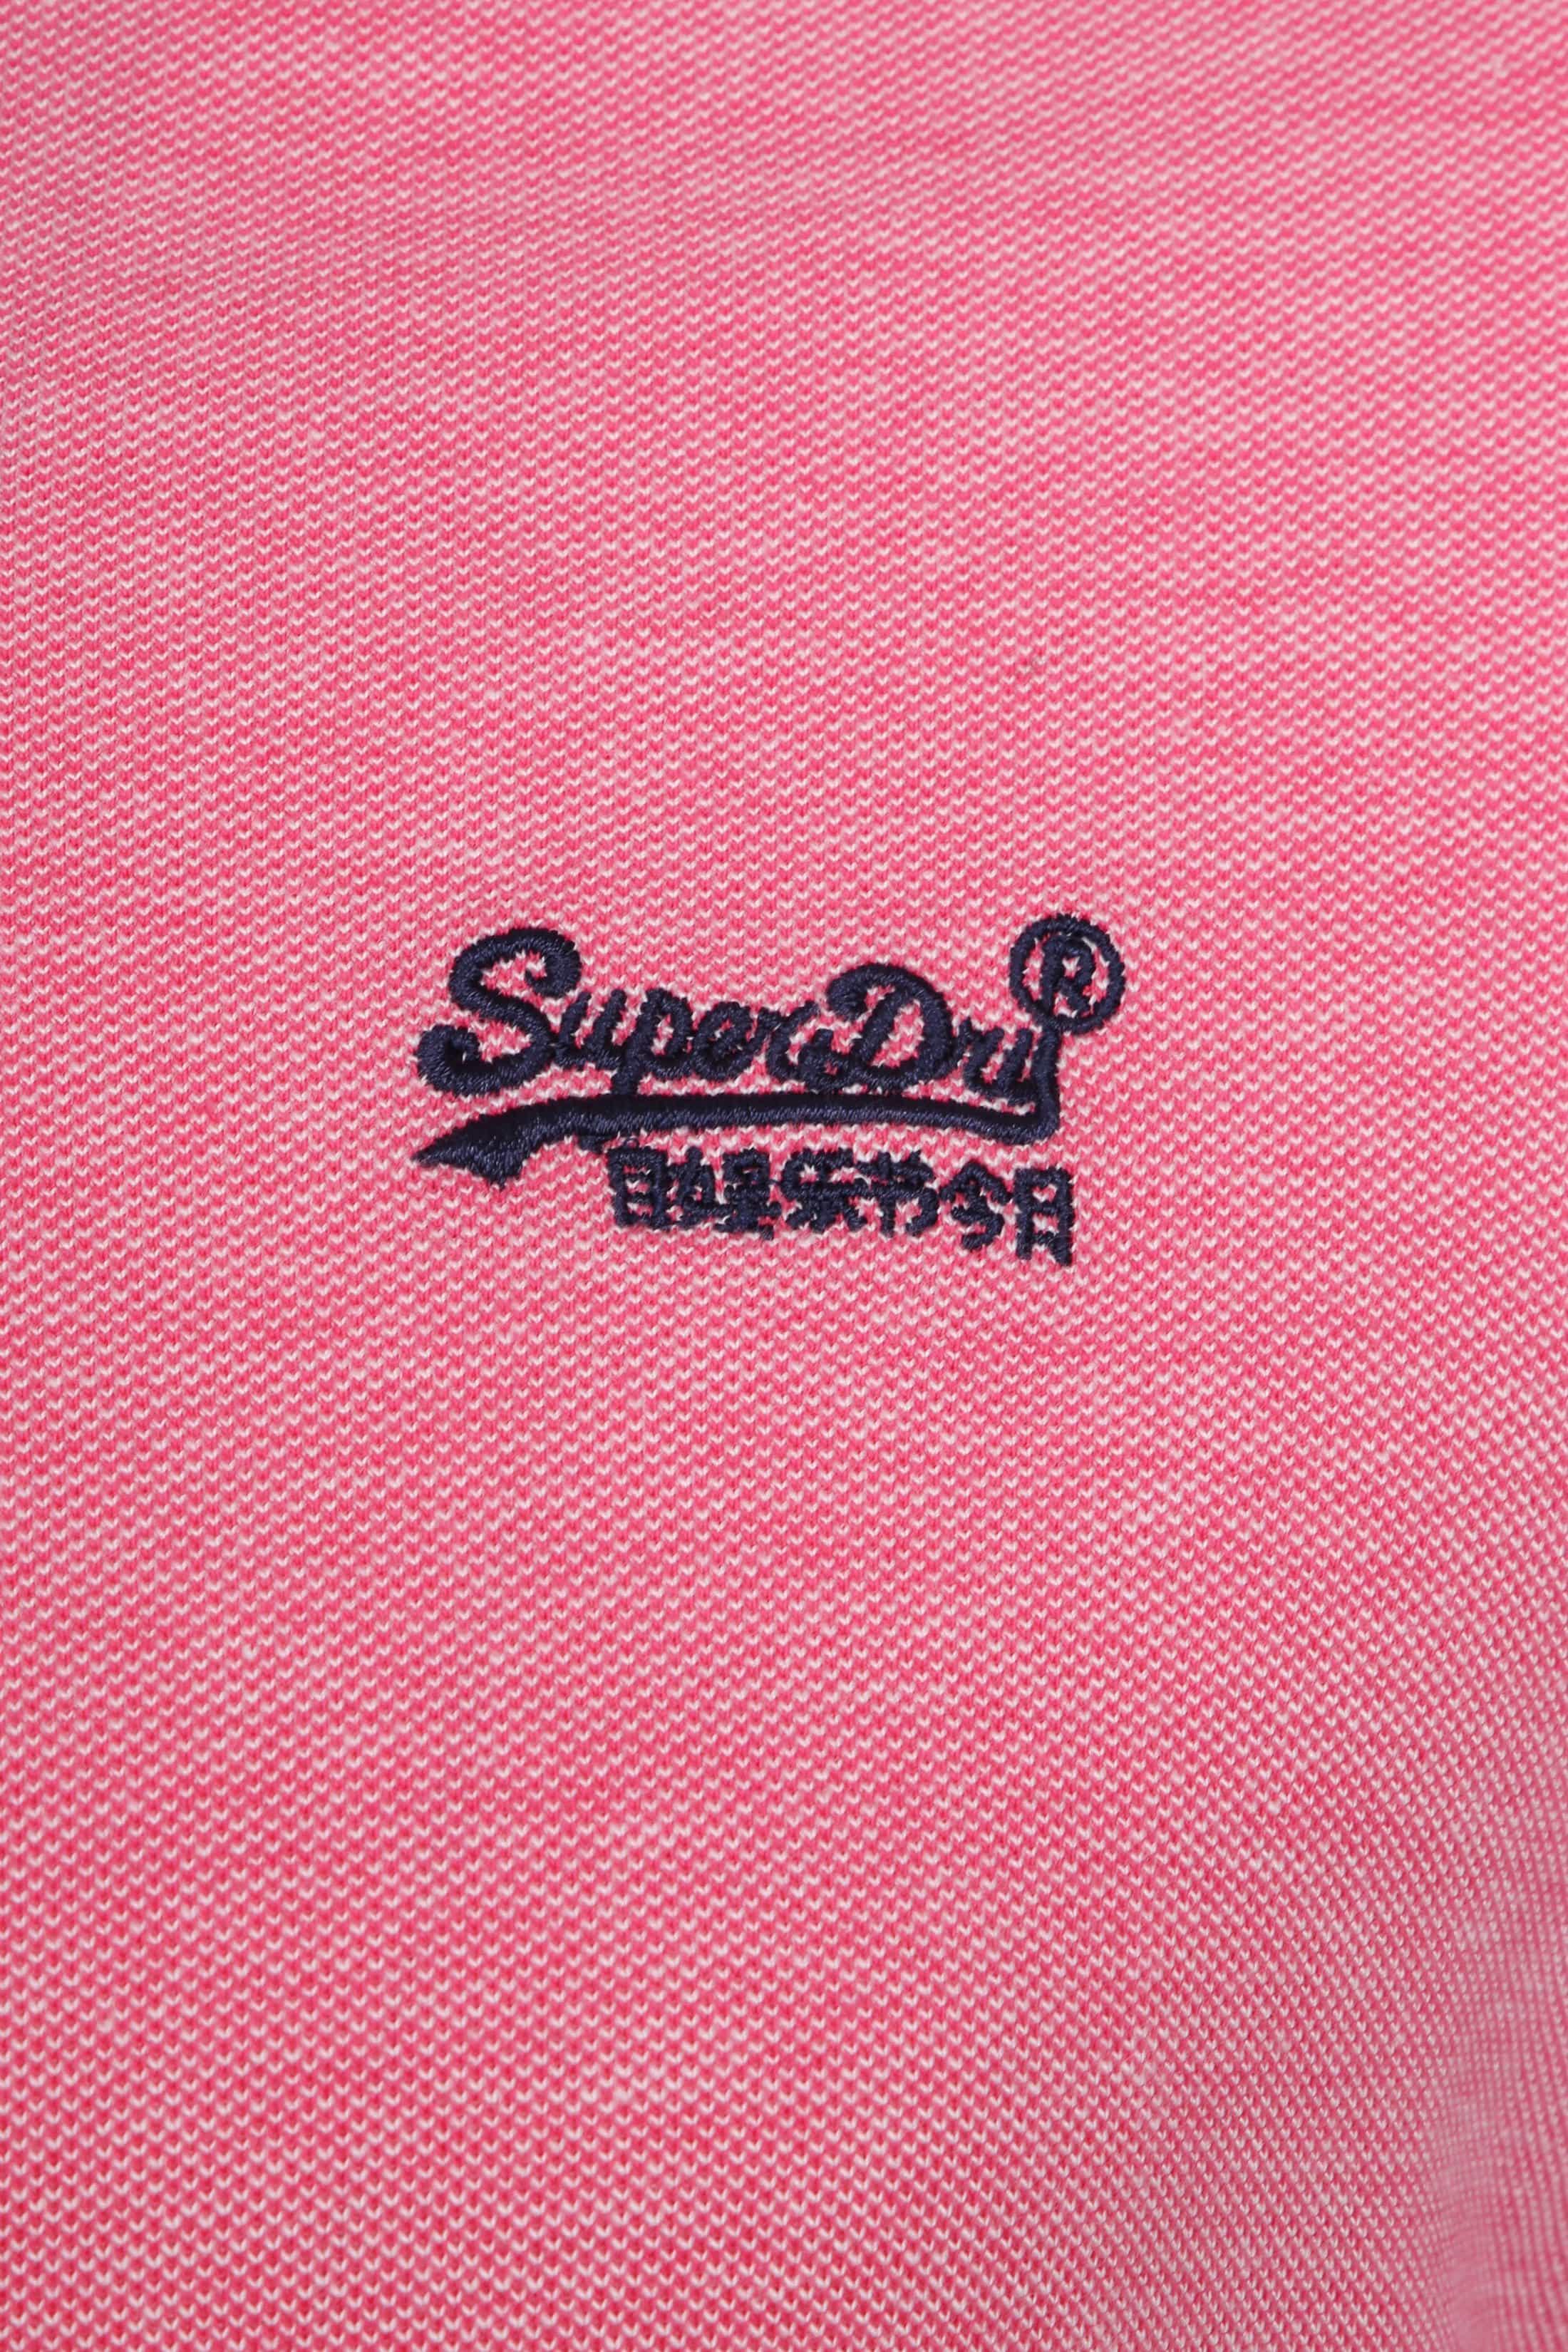 Superdry Premium Polo Pink foto 1